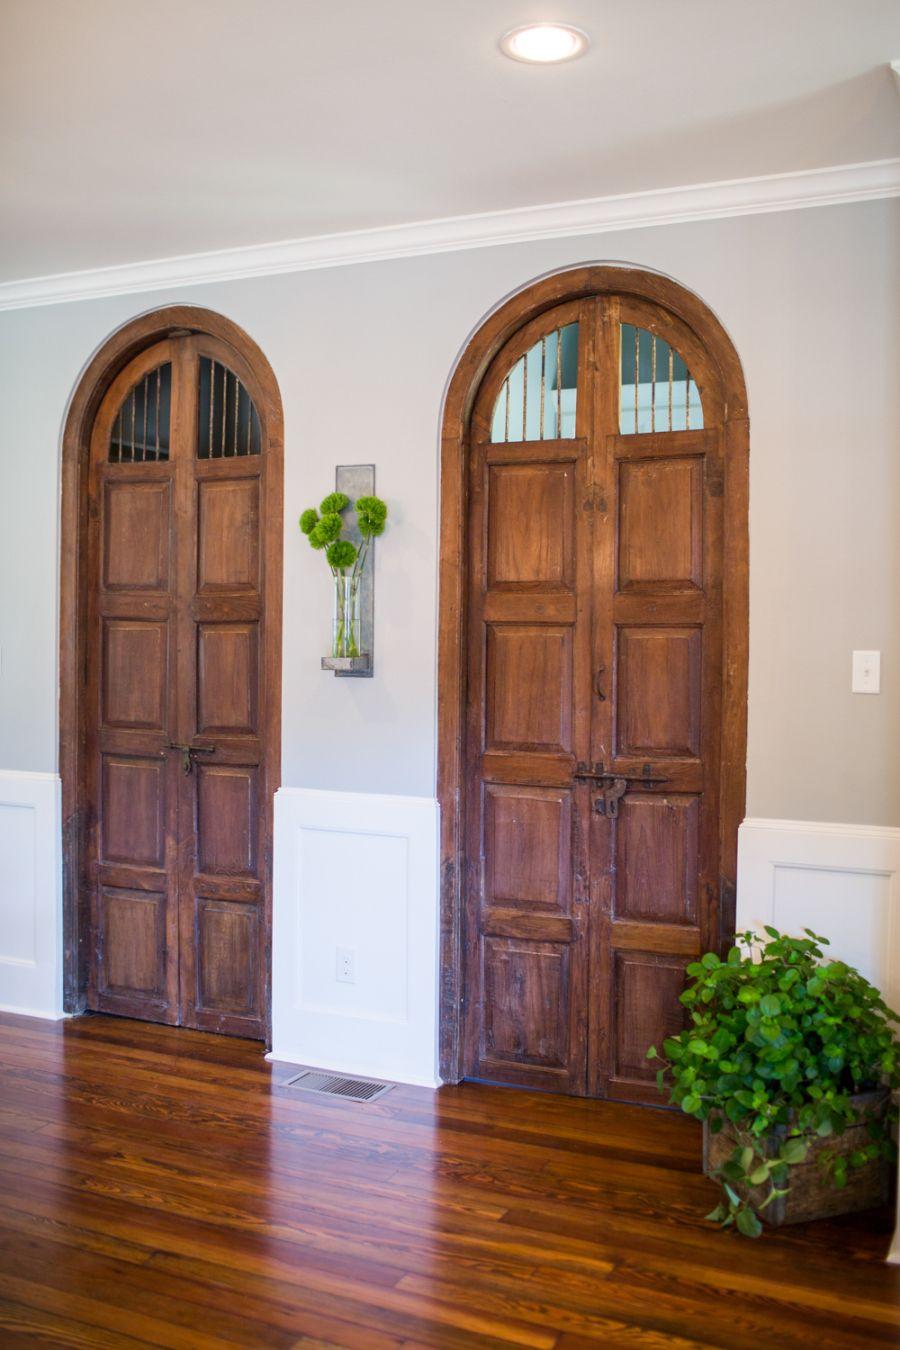 our favorite hgtv fixer upper interior design moments. Black Bedroom Furniture Sets. Home Design Ideas